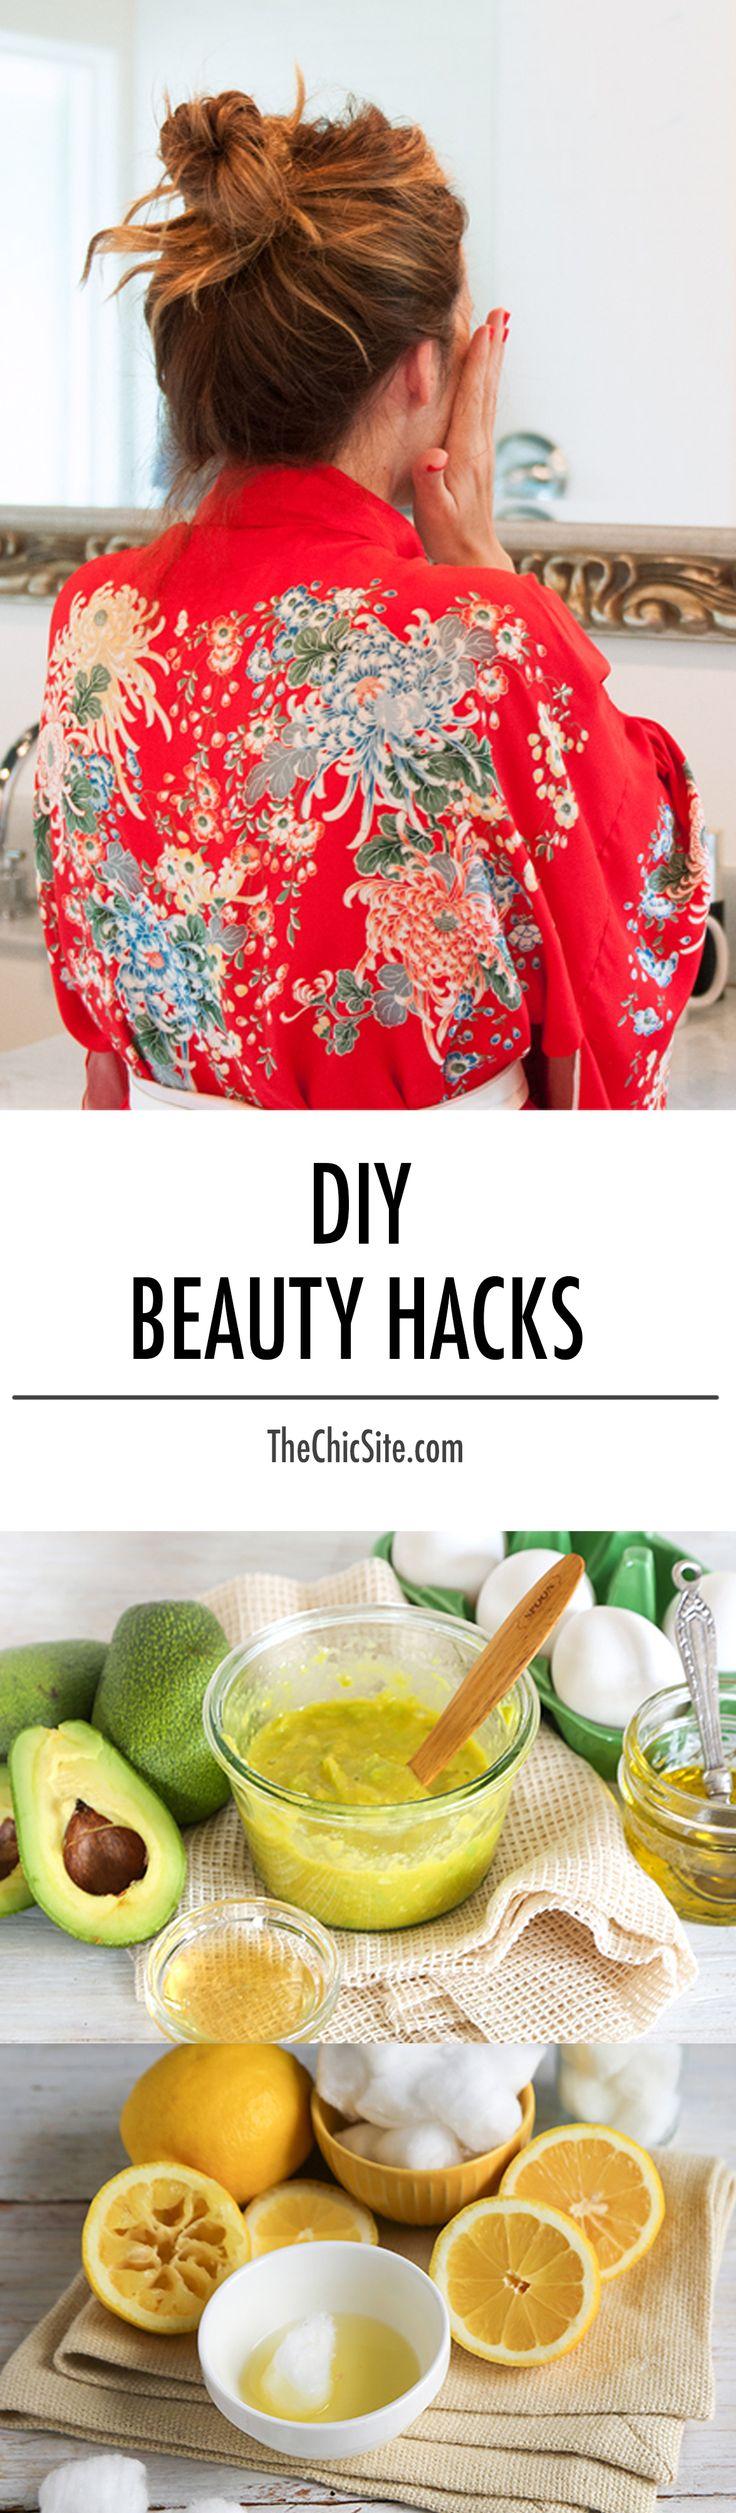 DIY Beauty Tips Hacks